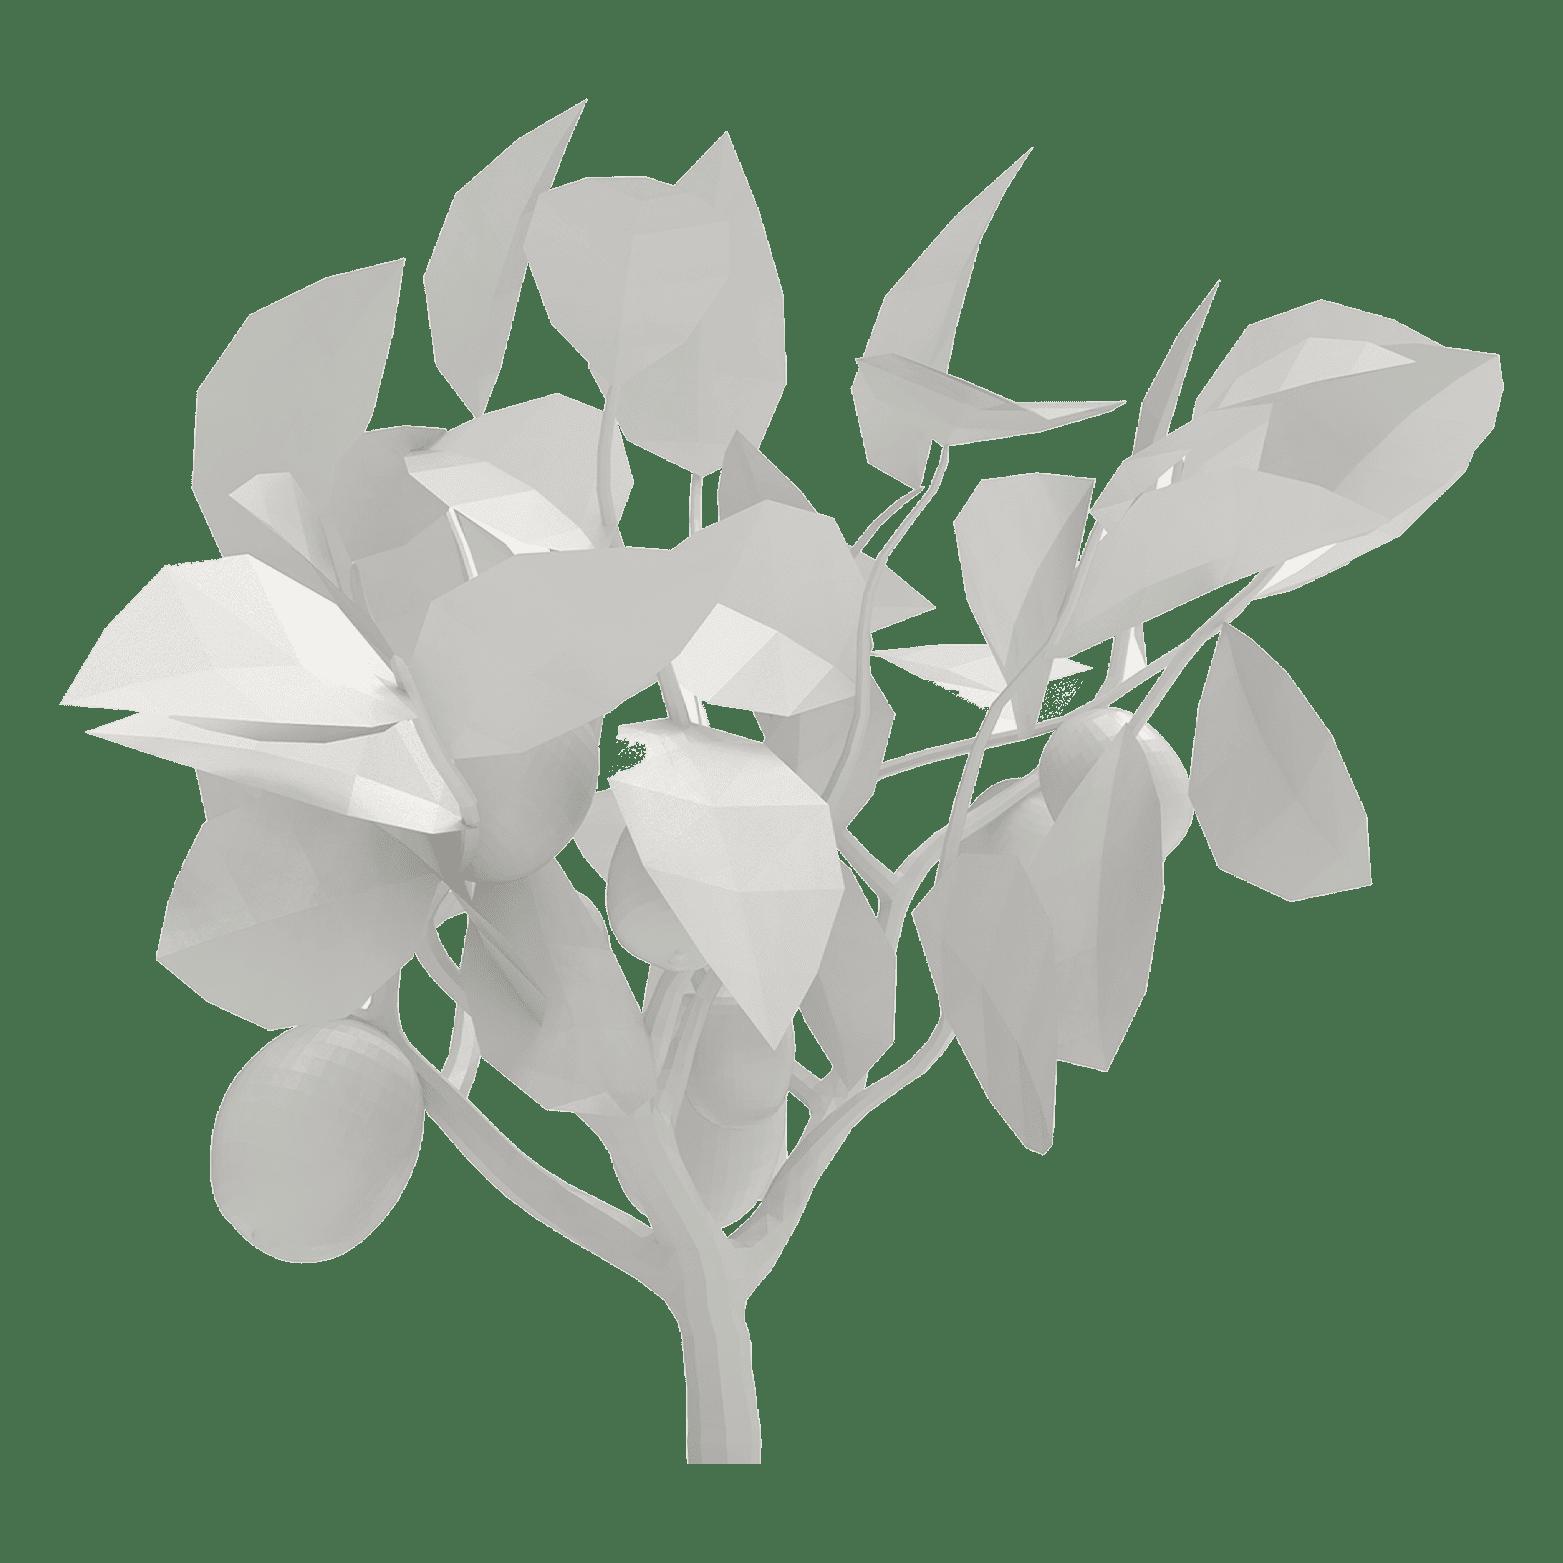 Environnement - light